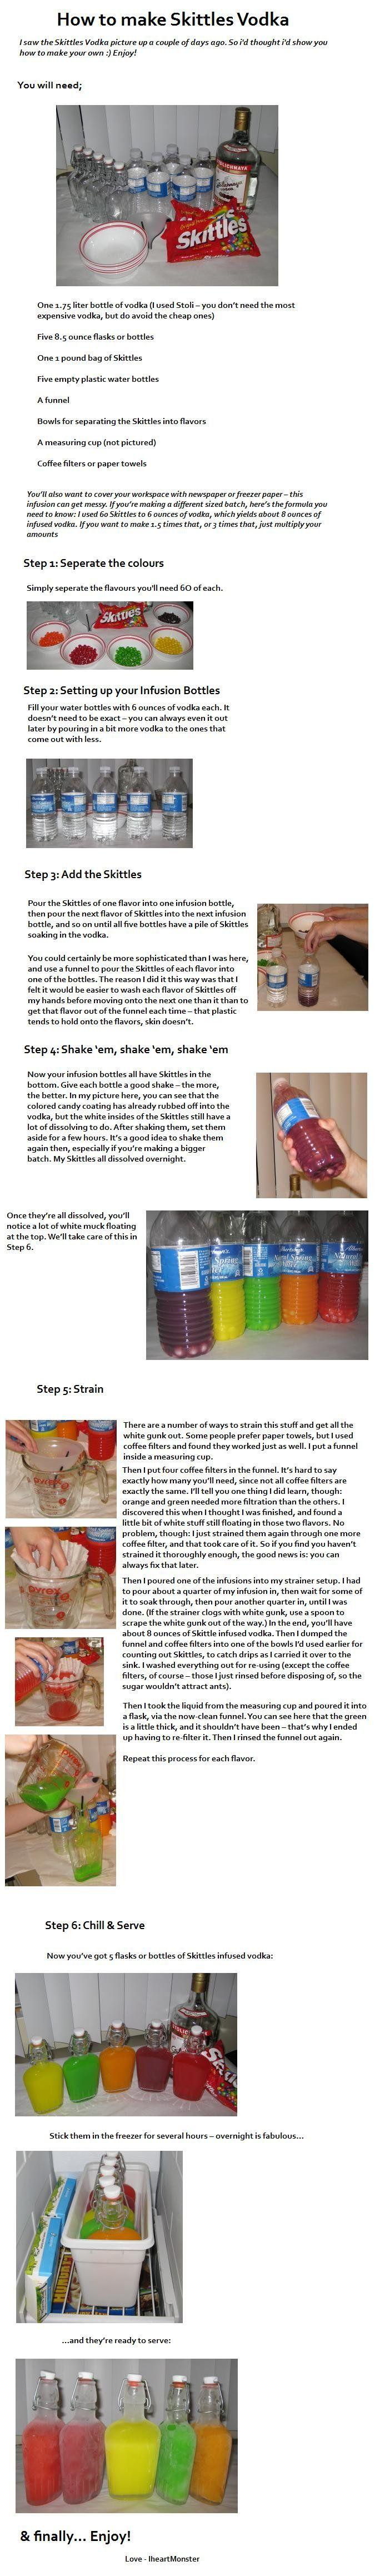 Skittles and vodka.... skittles vodka sounds yummy!!!